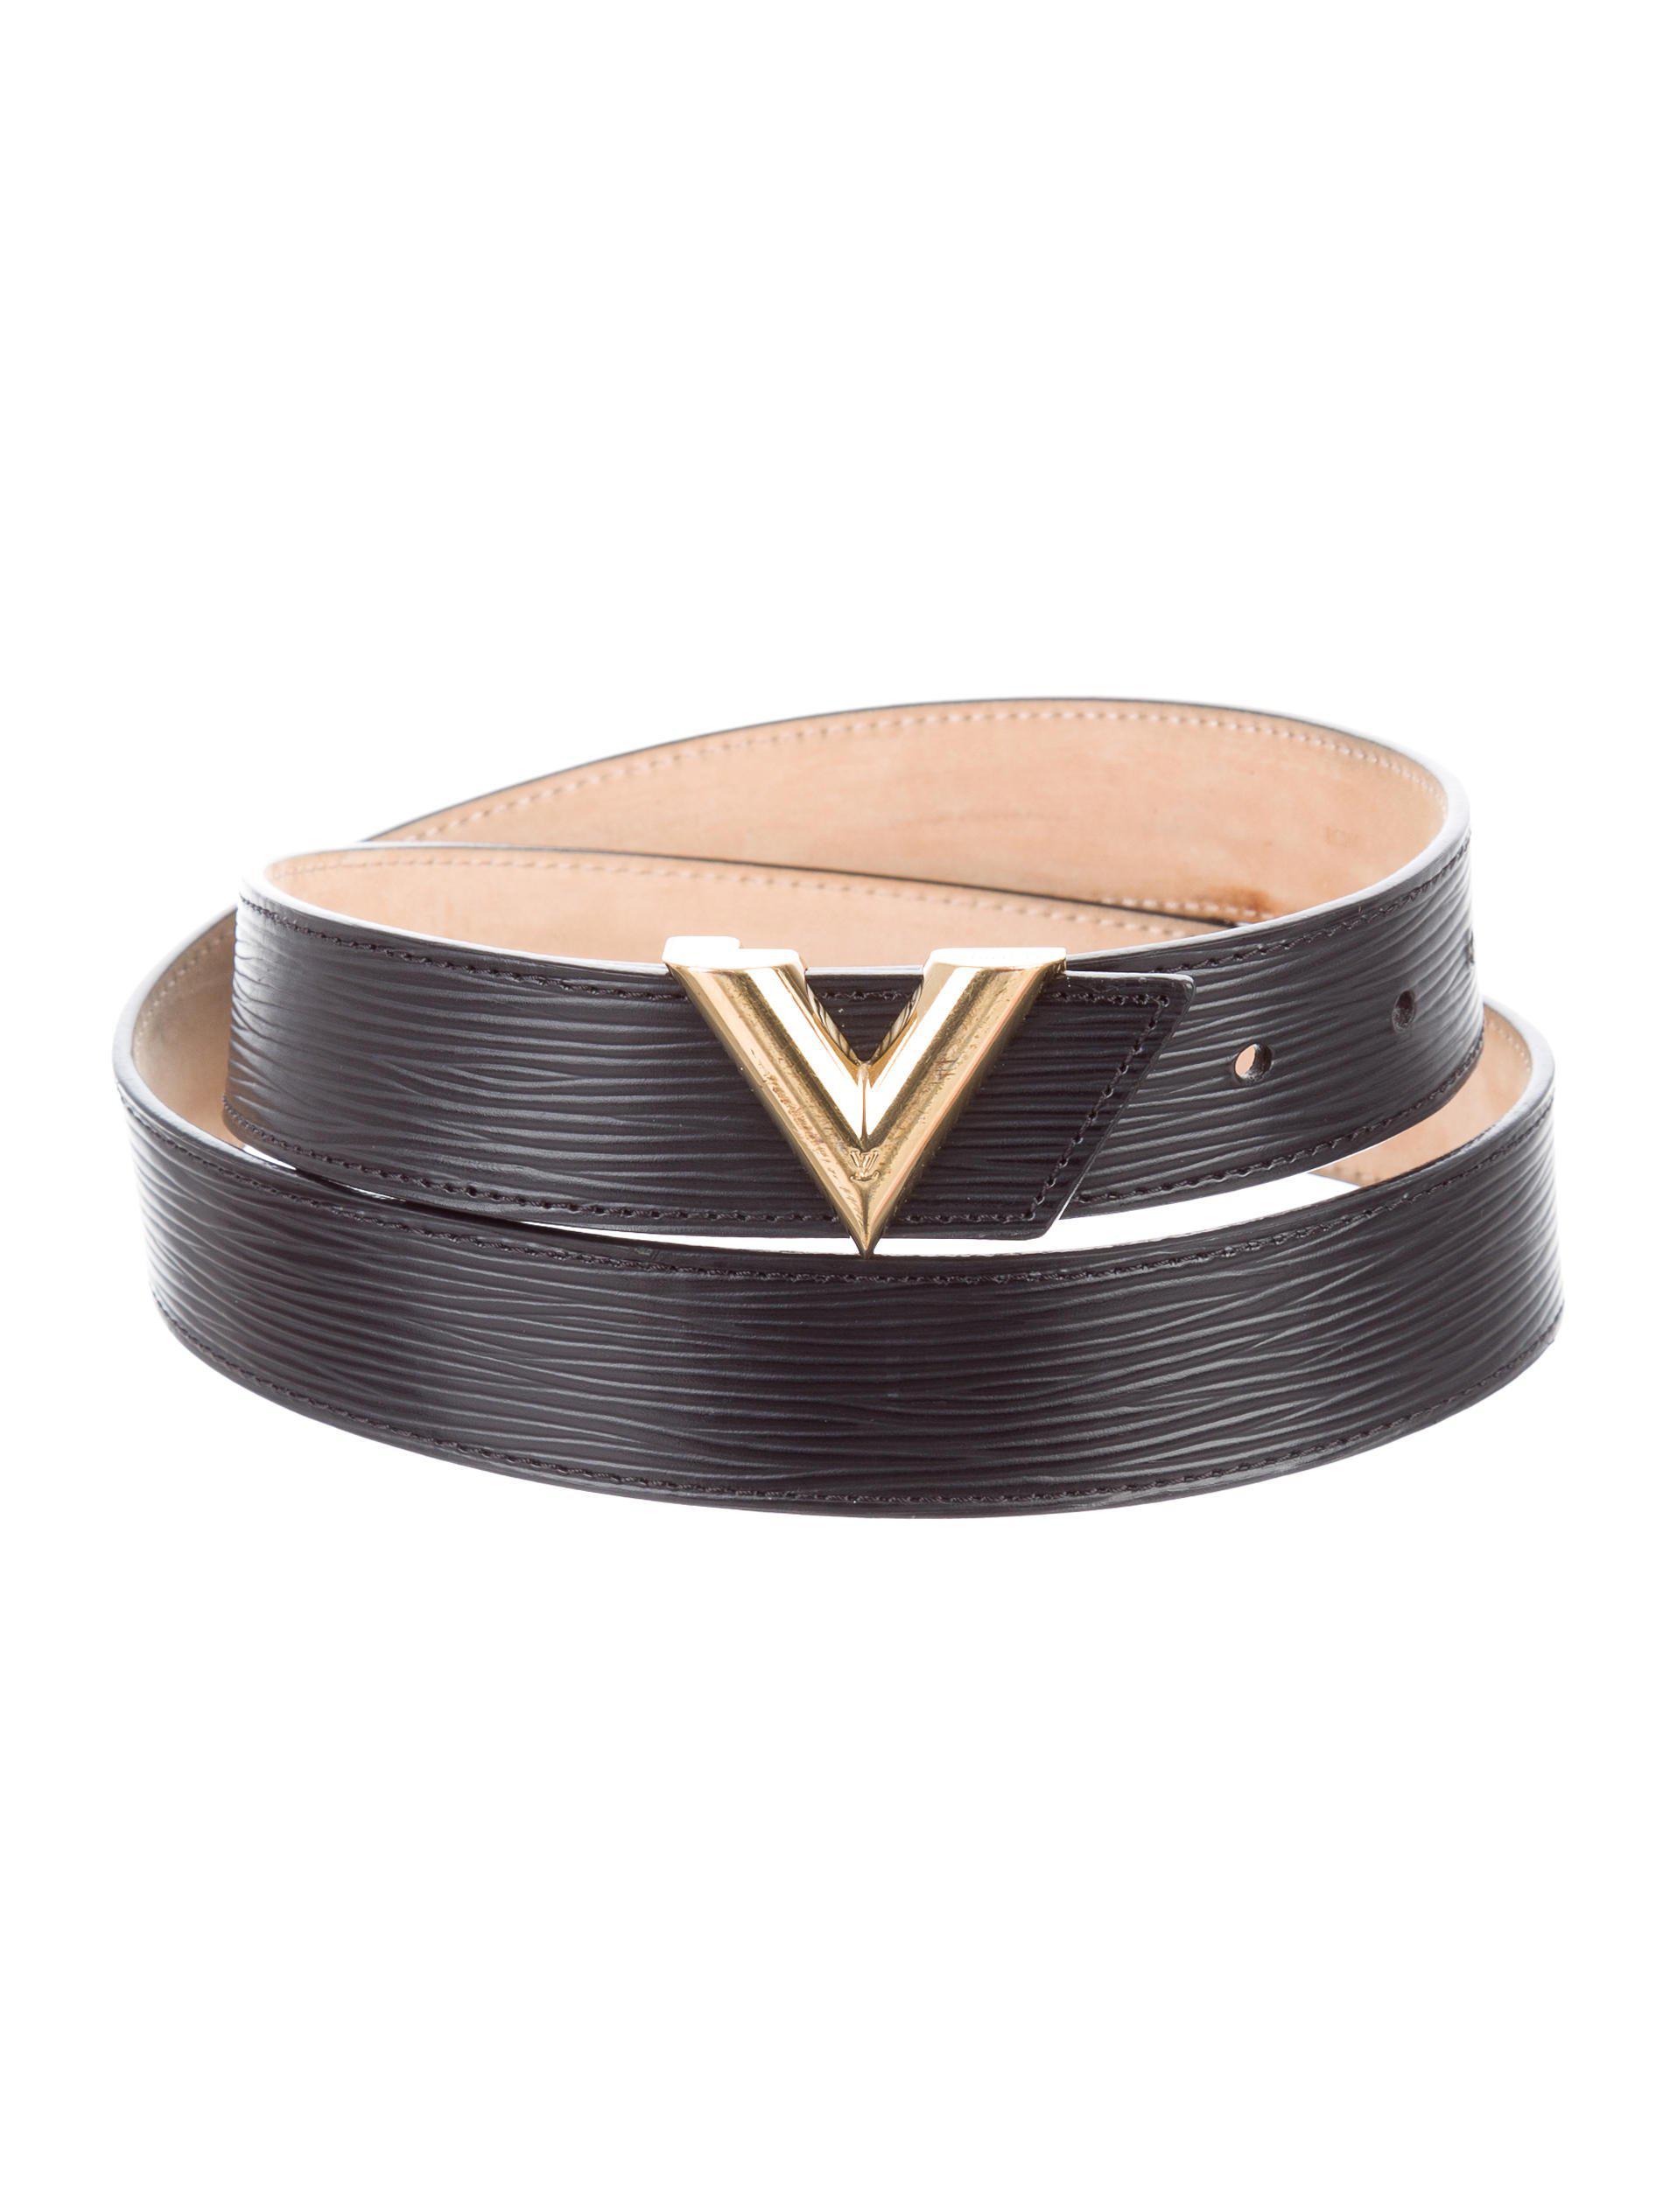 VIDA Leather Statement Clutch - THE DREAM CATCHER by VIDA rNE7mqHBid